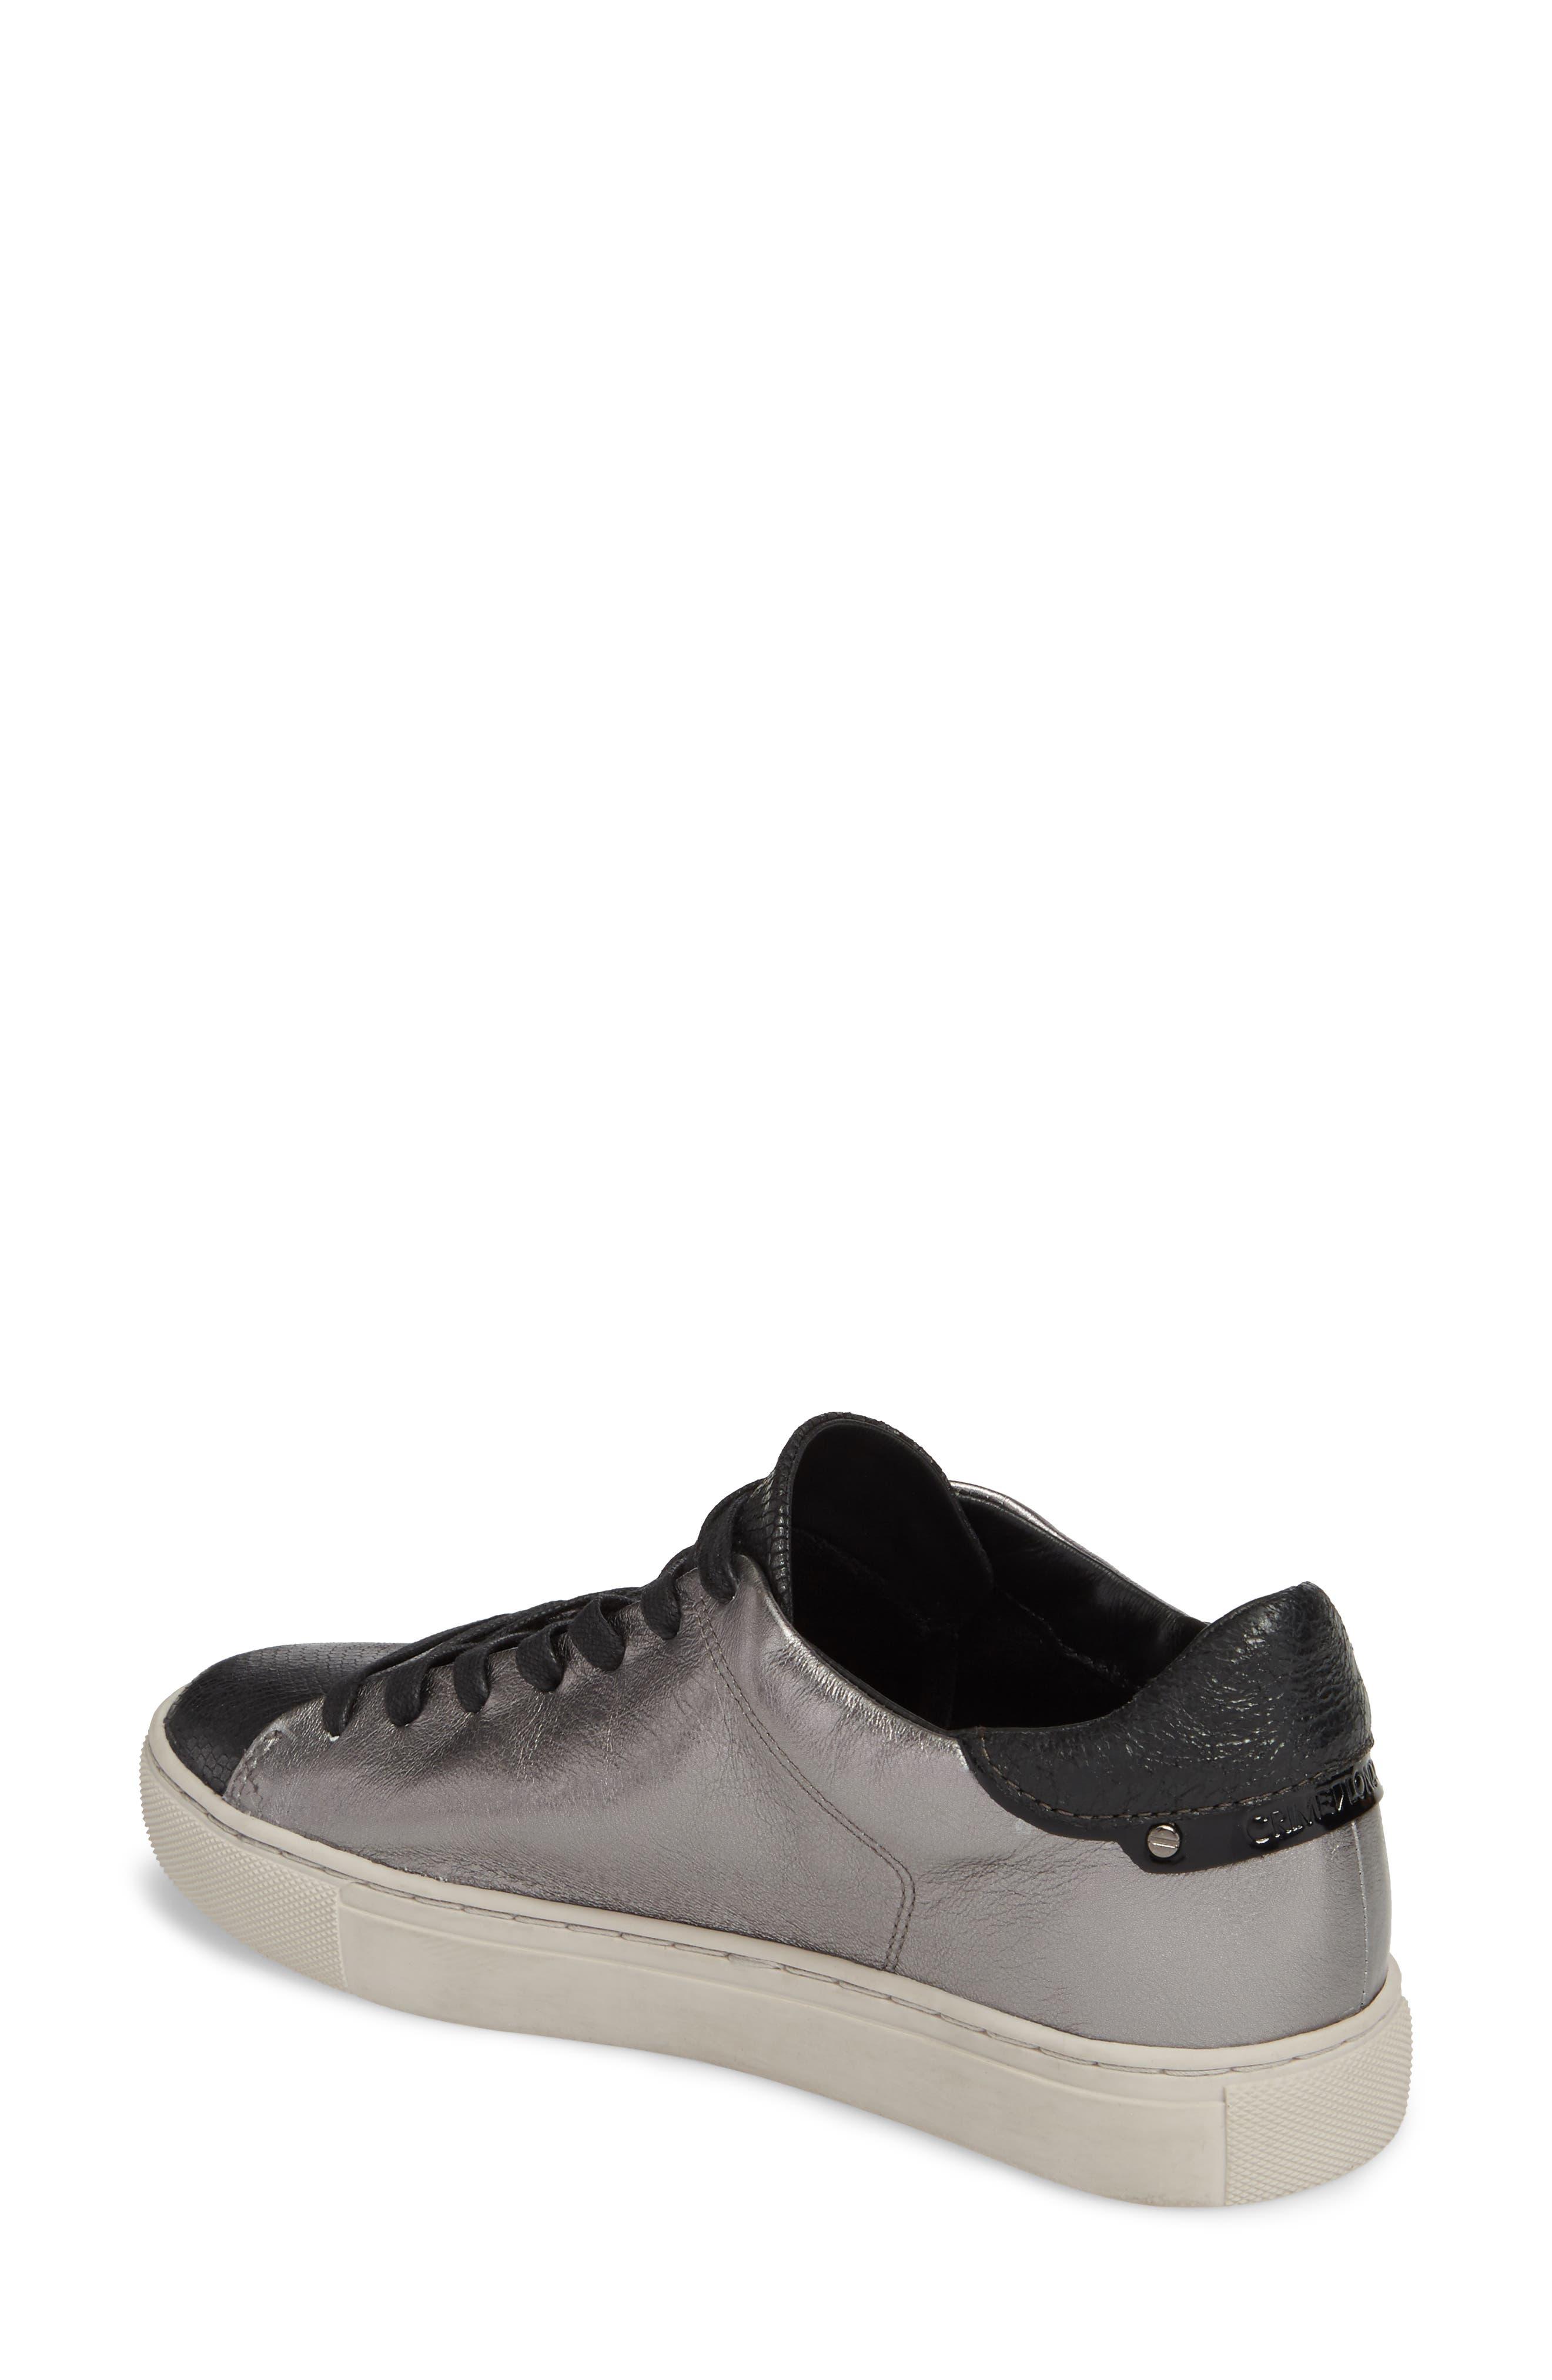 Beat Sneaker,                             Alternate thumbnail 2, color,                             040